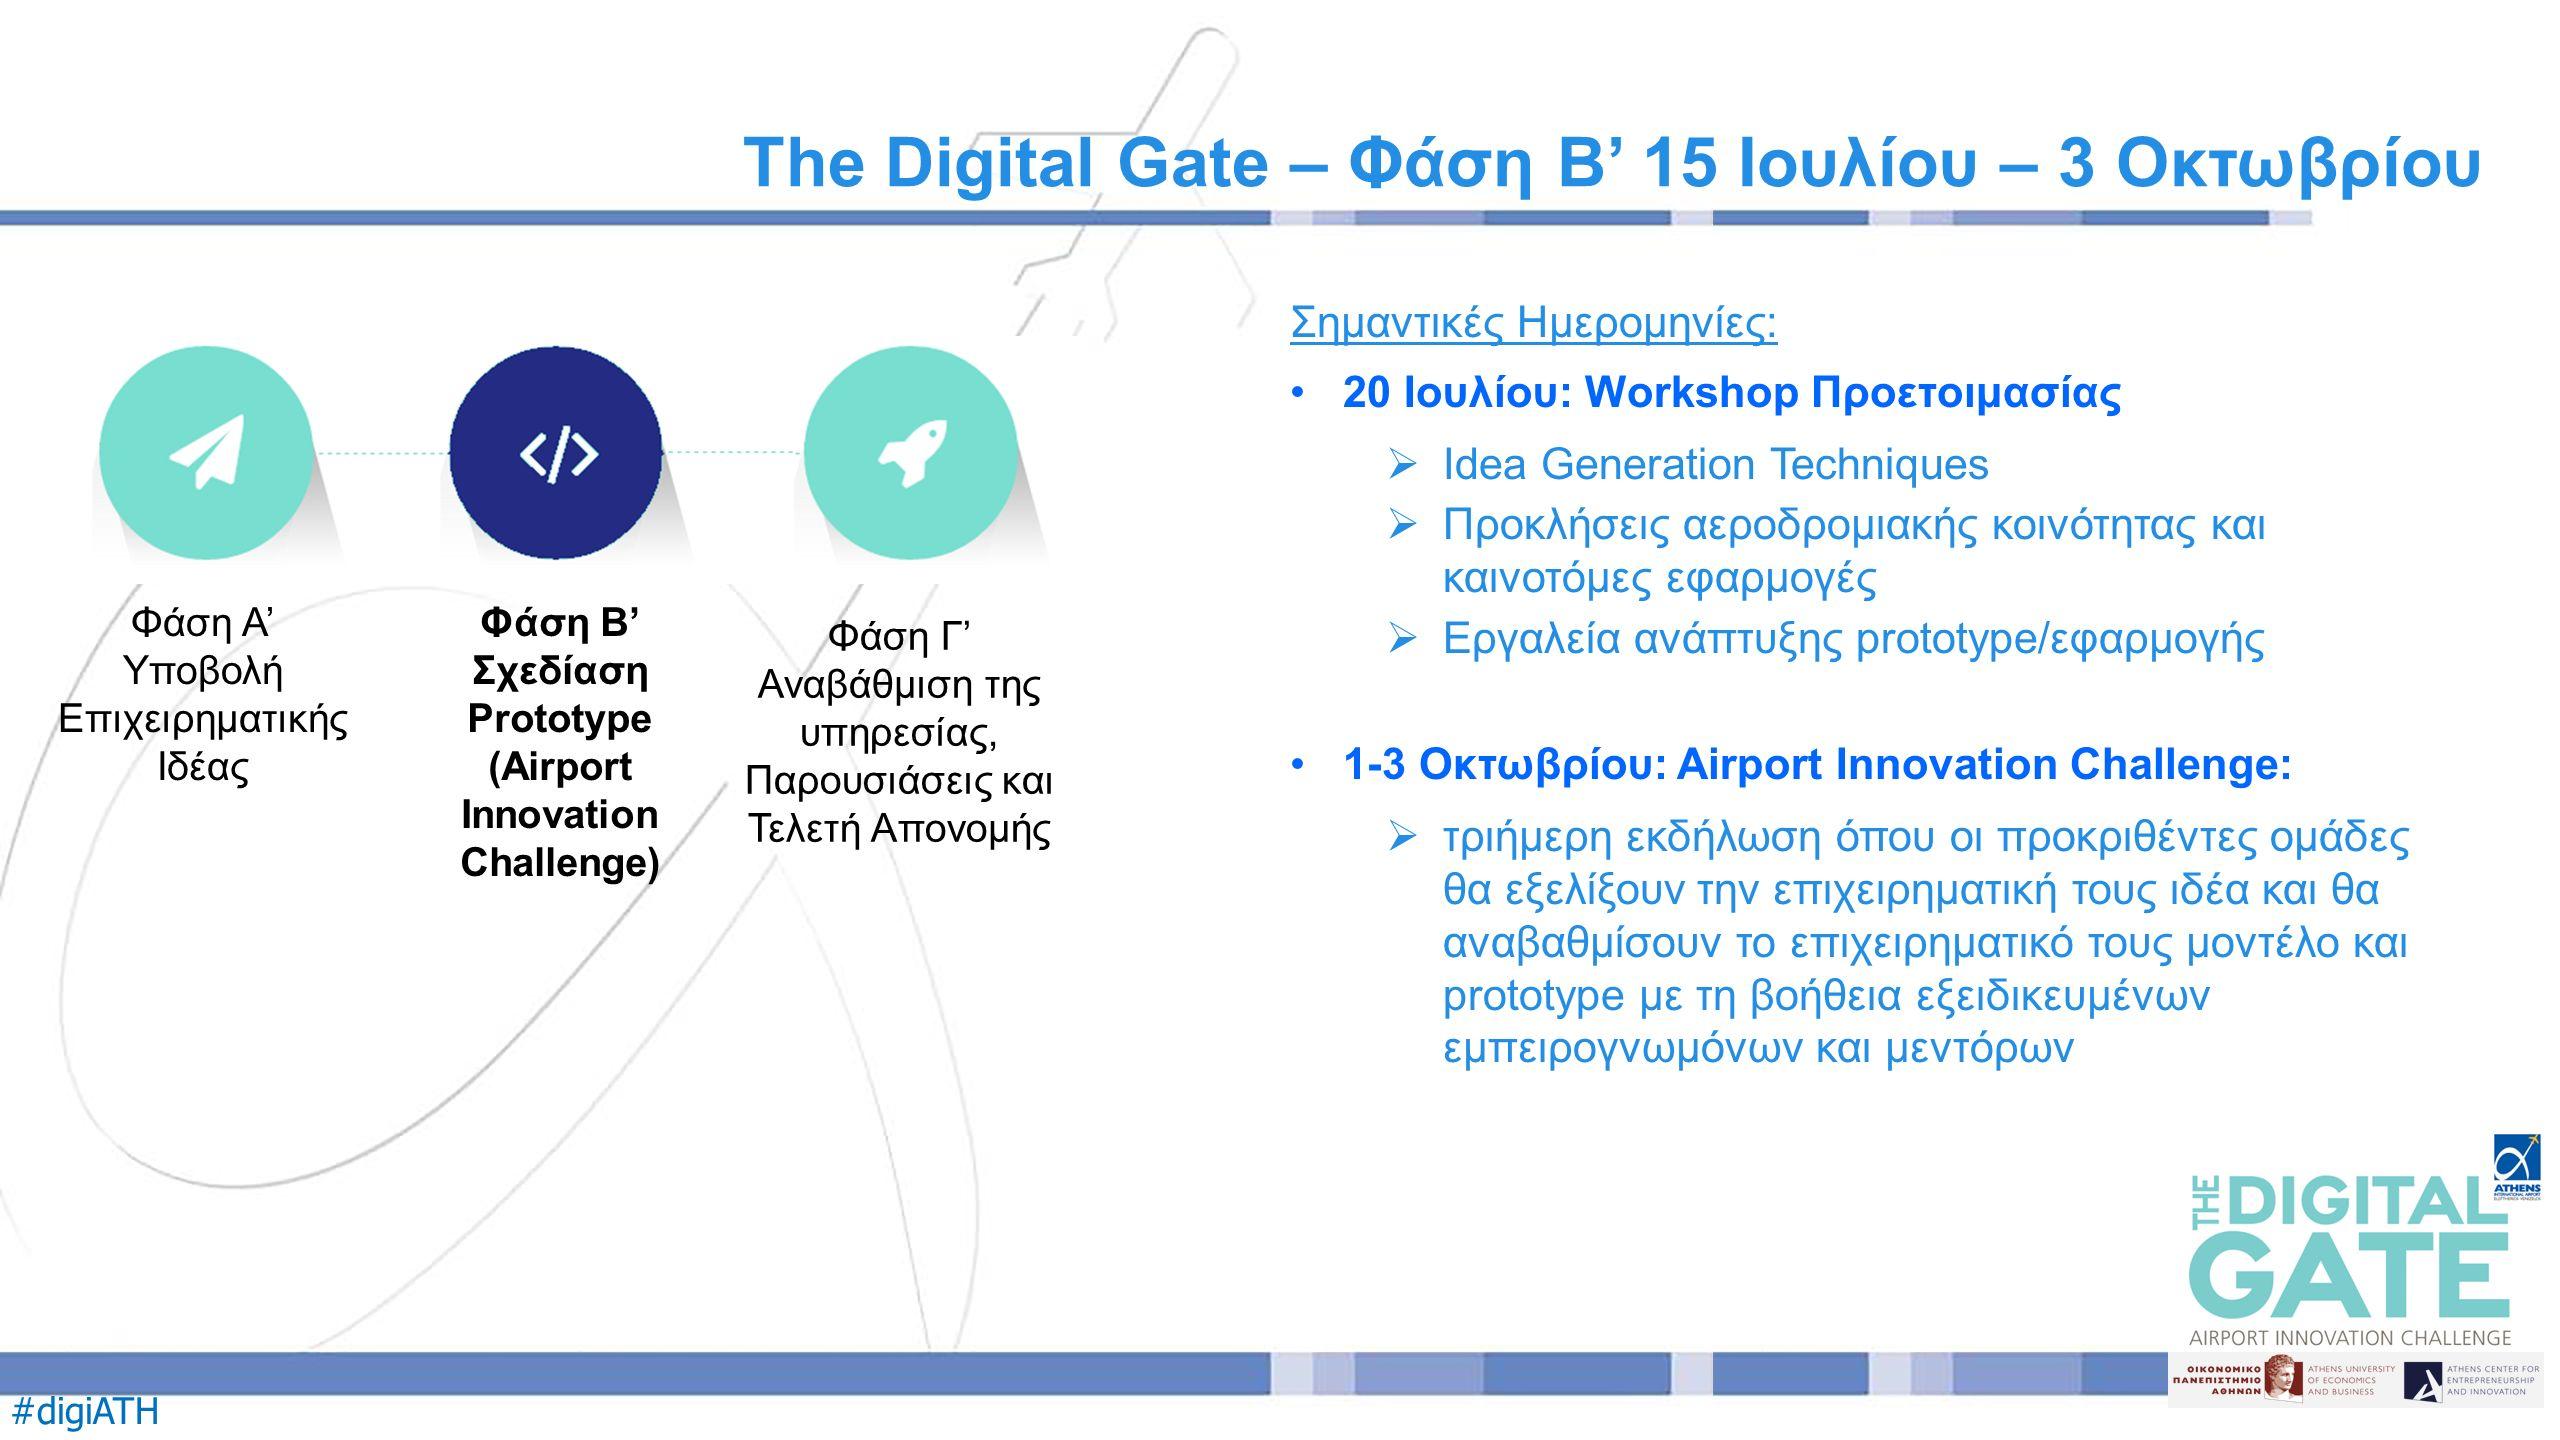 #digiATH Σημαντικές Ημερομηνίες: 20 Ιουλίου: Workshop Προετοιμασίας  Idea Generation Techniques  Προκλήσεις αεροδρομιακής κοινότητας και καινοτόμες εφαρμογές  Εργαλεία ανάπτυξης prototype/εφαρμογής 1-3 Οκτωβρίου: Airport Innovation Challenge:  τριήμερη εκδήλωση όπου οι προκριθέντες ομάδες θα εξελίξουν την επιχειρηματική τους ιδέα και θα αναβαθμίσουν το επιχειρηματικό τους μοντέλο και prototype με τη βοήθεια εξειδικευμένων εμπειρογνωμόνων και μεντόρων The Digital Gate – Φάση Β' 15 Ιουλίου – 3 Οκτωβρίου Φάση Α' Υποβολή Επιχειρηματικής Ιδέας Φάση Β' Σχεδίαση Prototype (Airport Innovation Challenge) Φάση Γ' Αναβάθμιση της υπηρεσίας, Παρουσιάσεις και Τελετή Απονομής